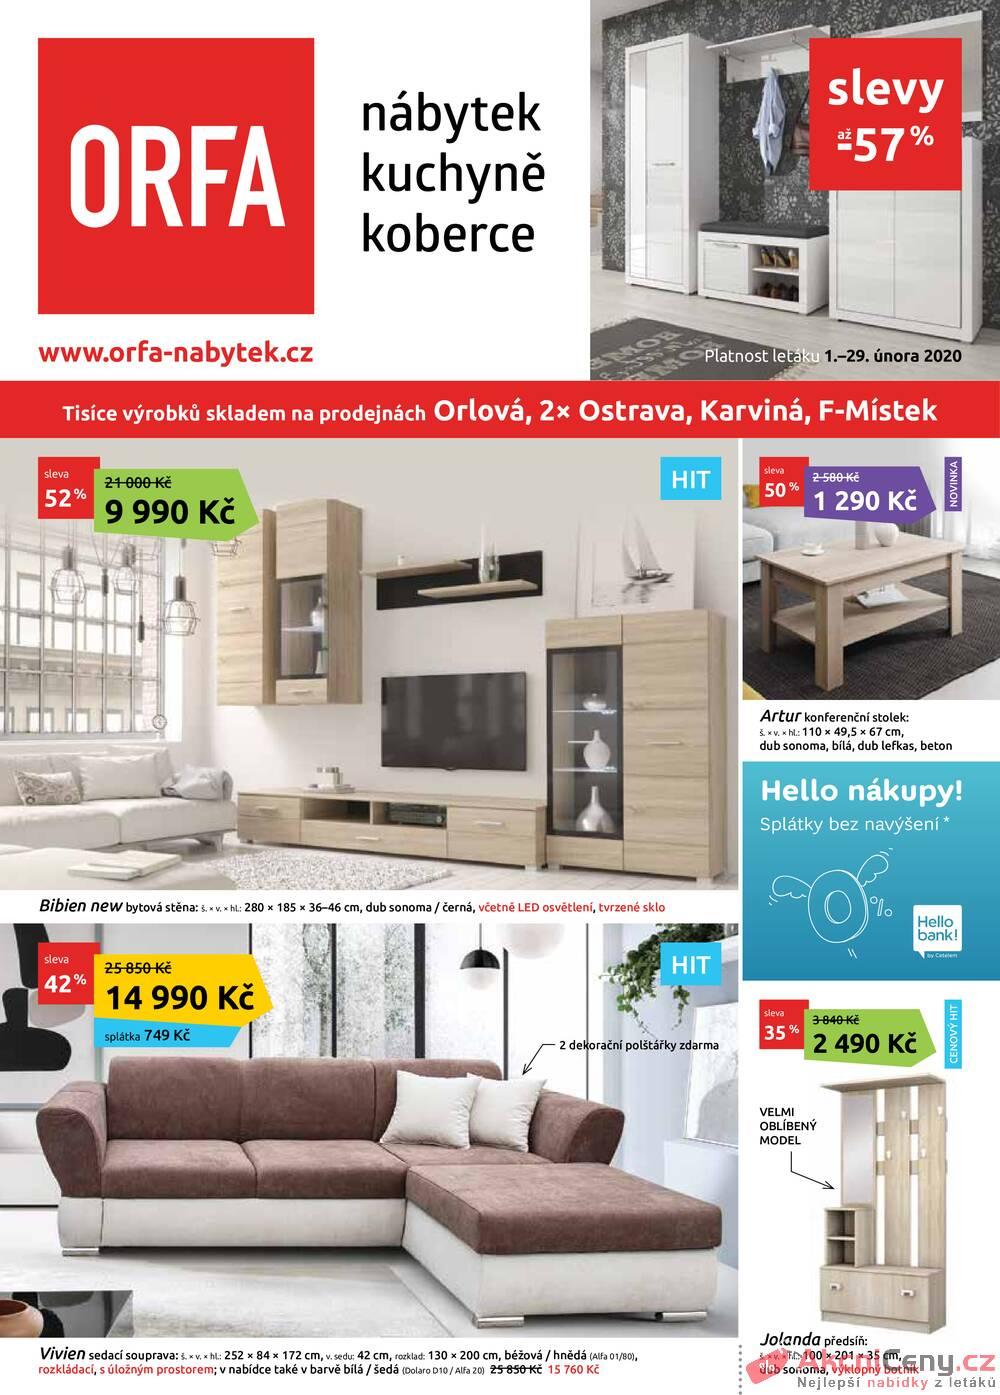 Leták Orfa Nábytek - Orfa Nábytek od 1.2. do 29.2.2020 - strana 1